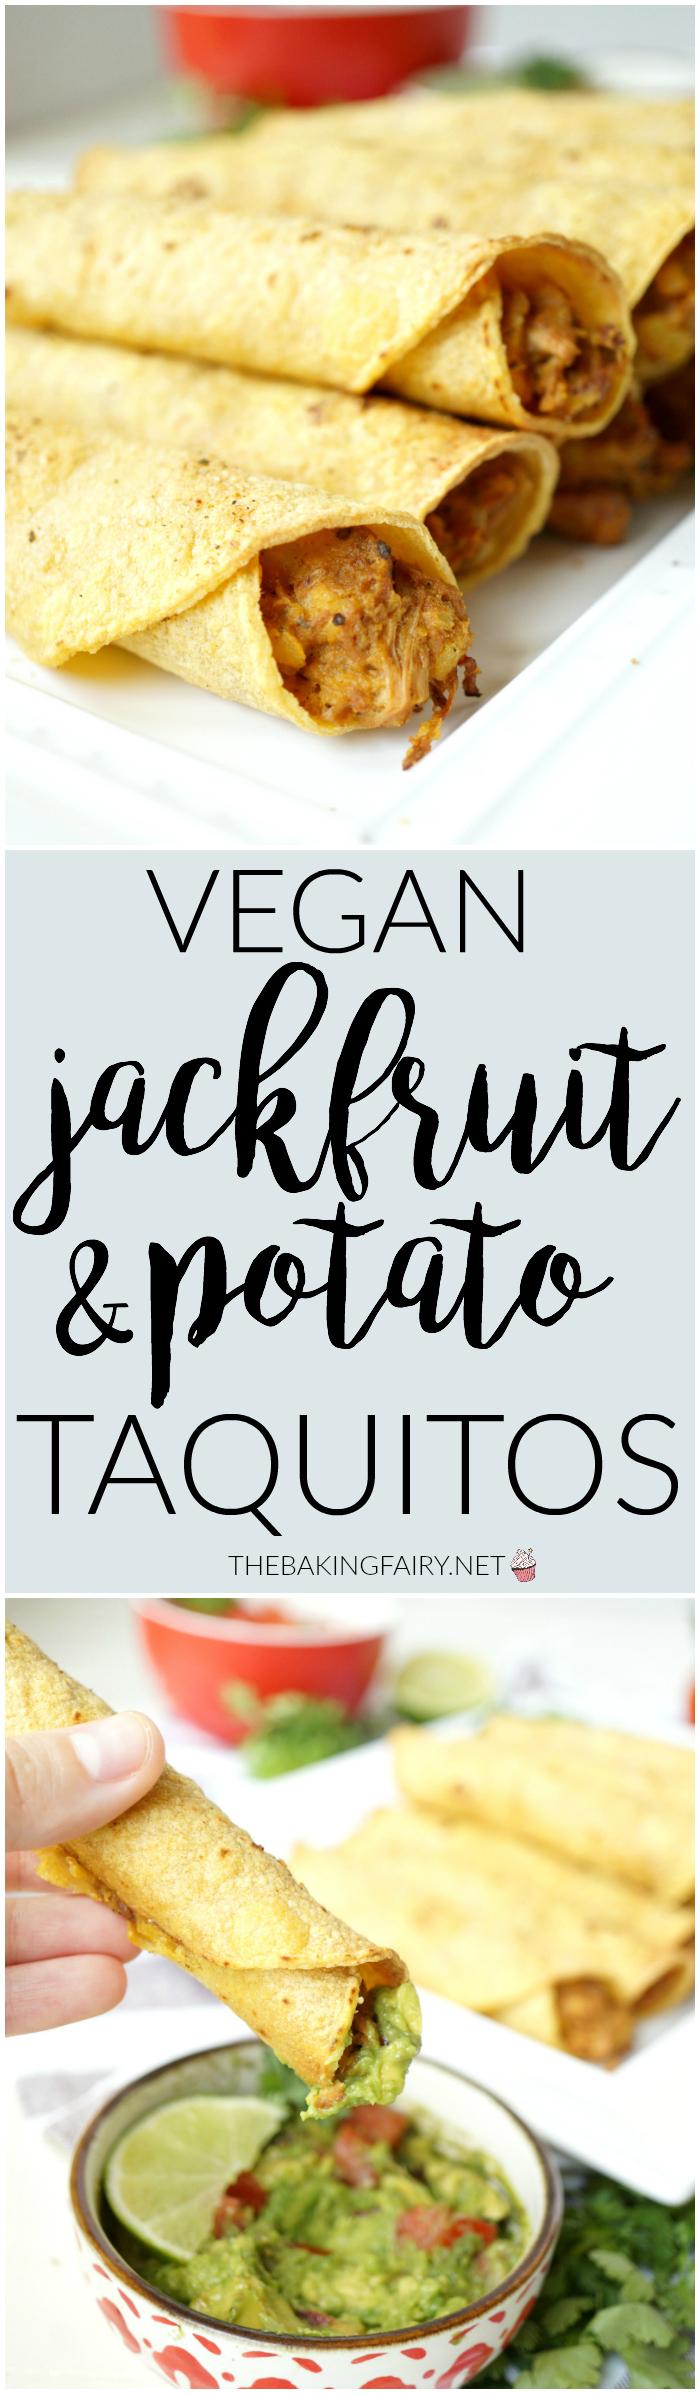 vegan jackfruit & potato taquitos | The Baking Fairy